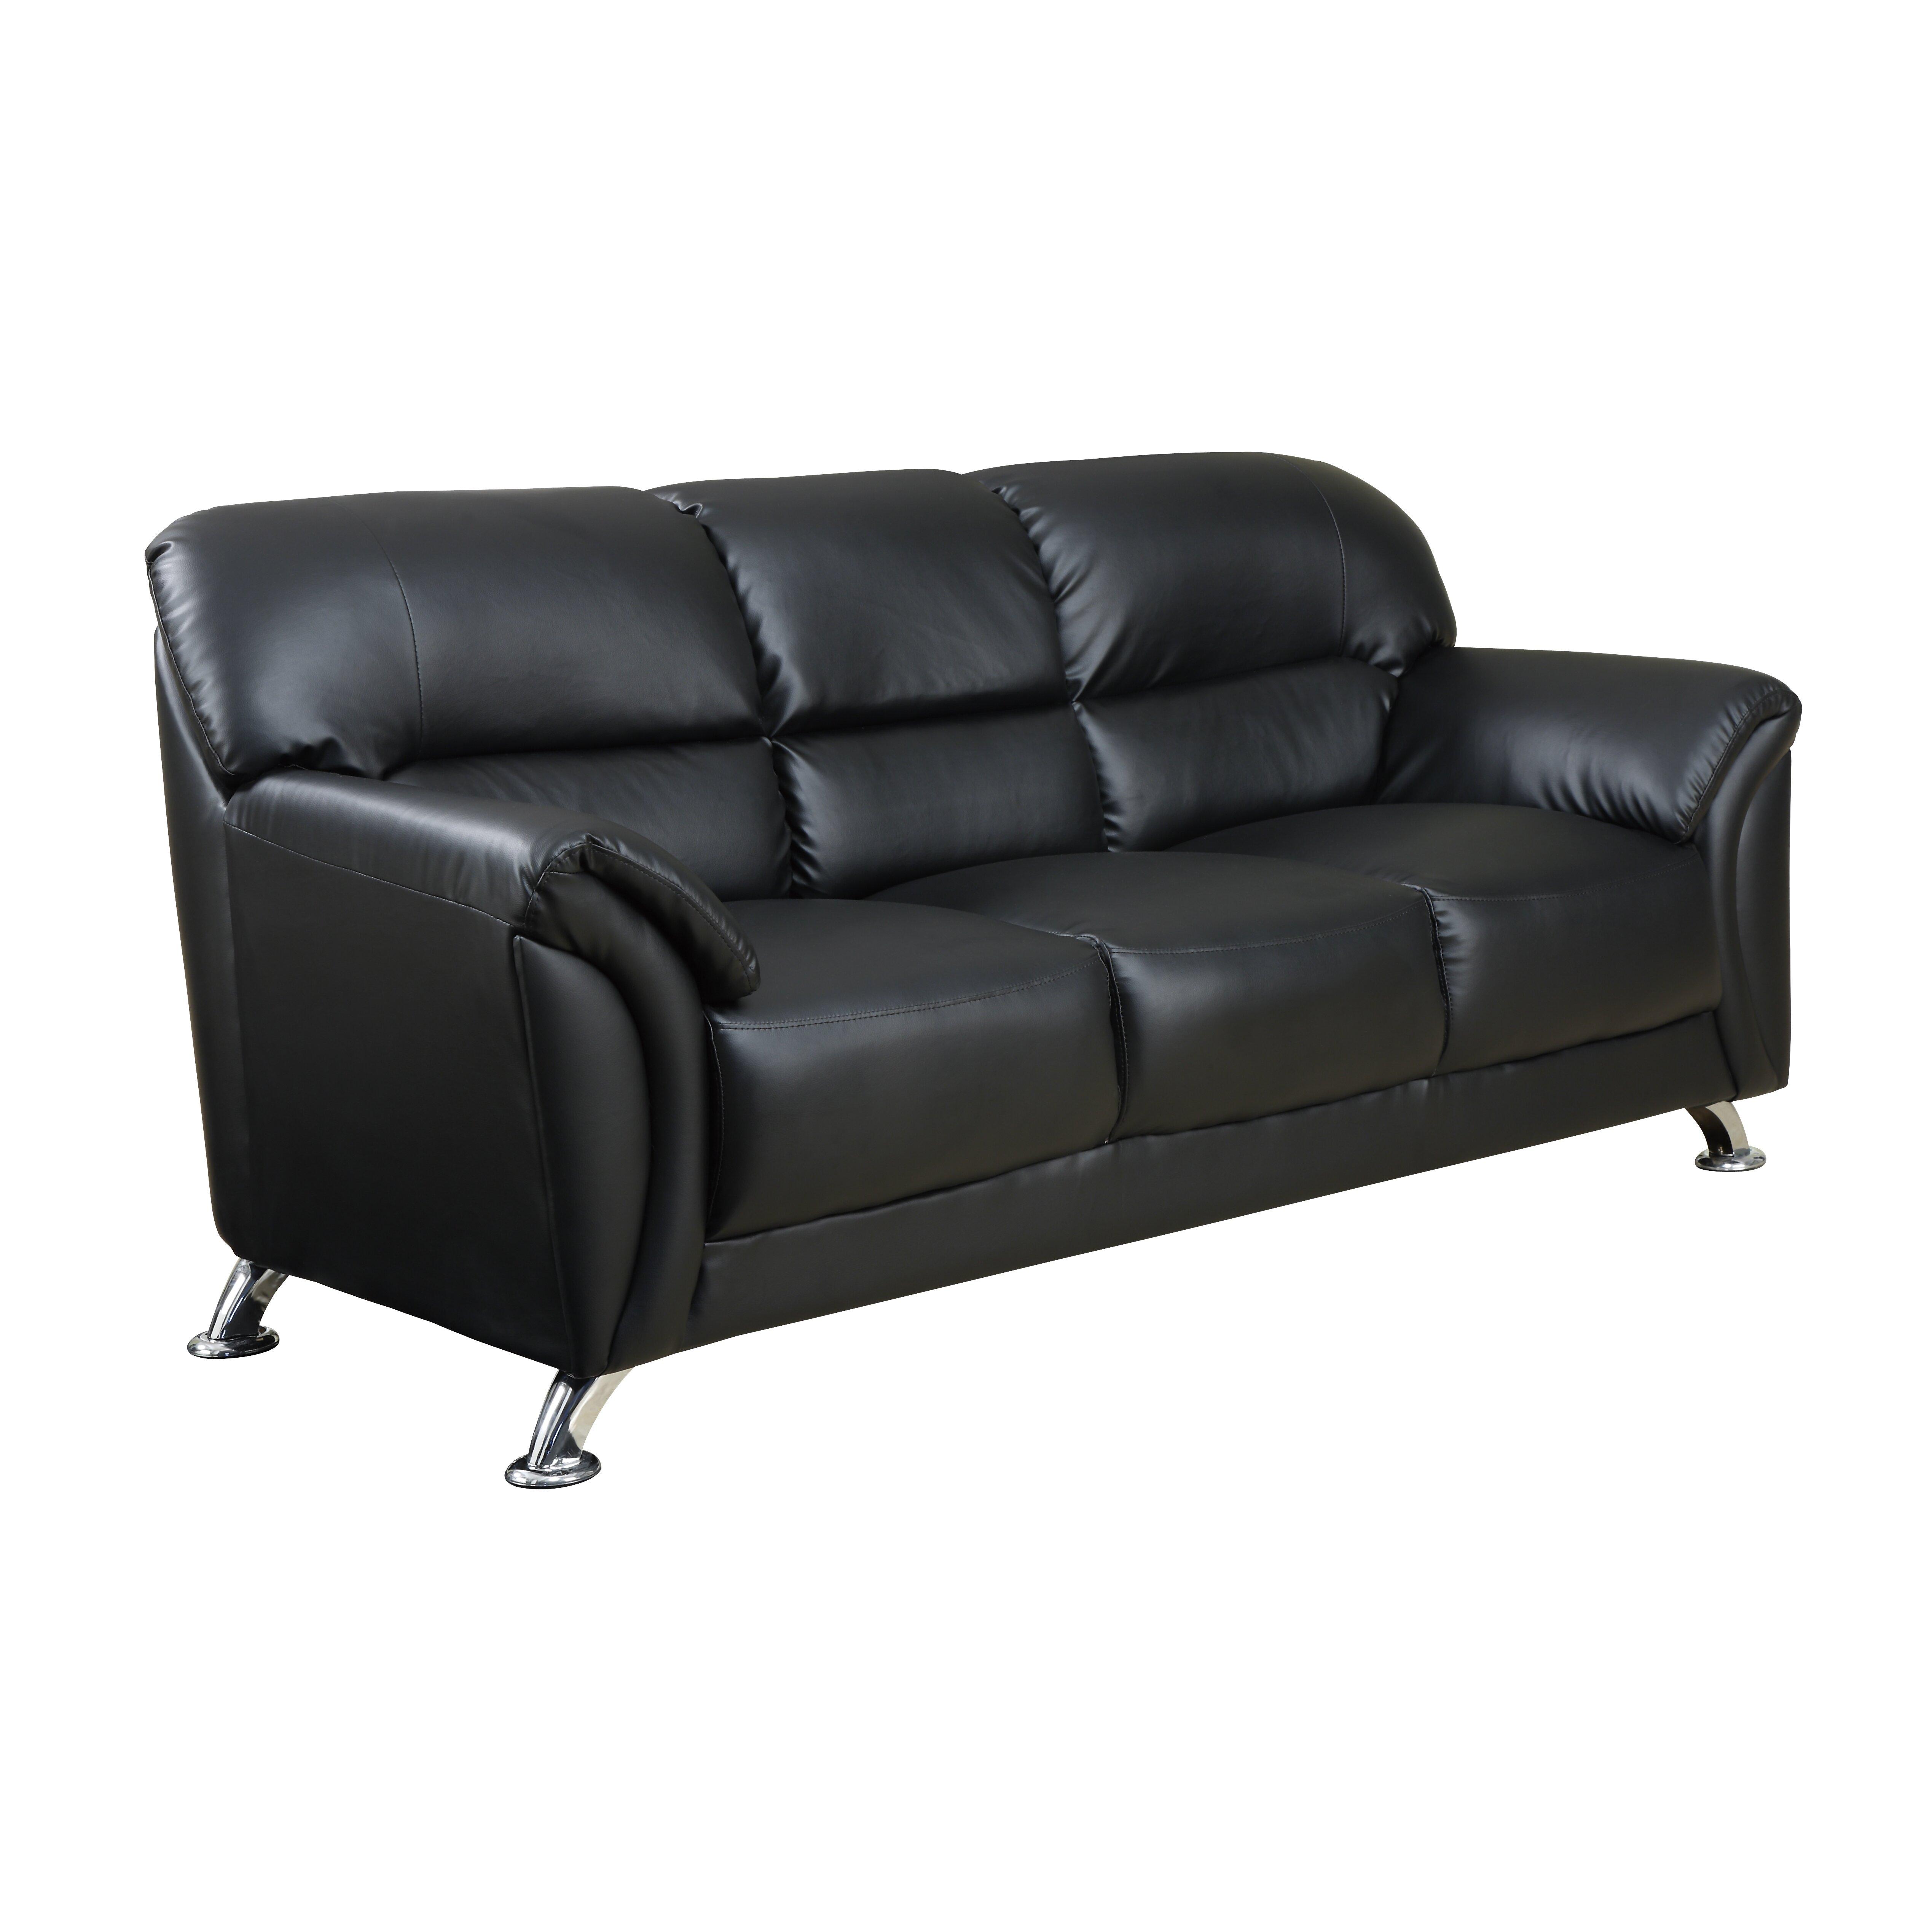 Global furniture usa sofa reviews for Furniture usa